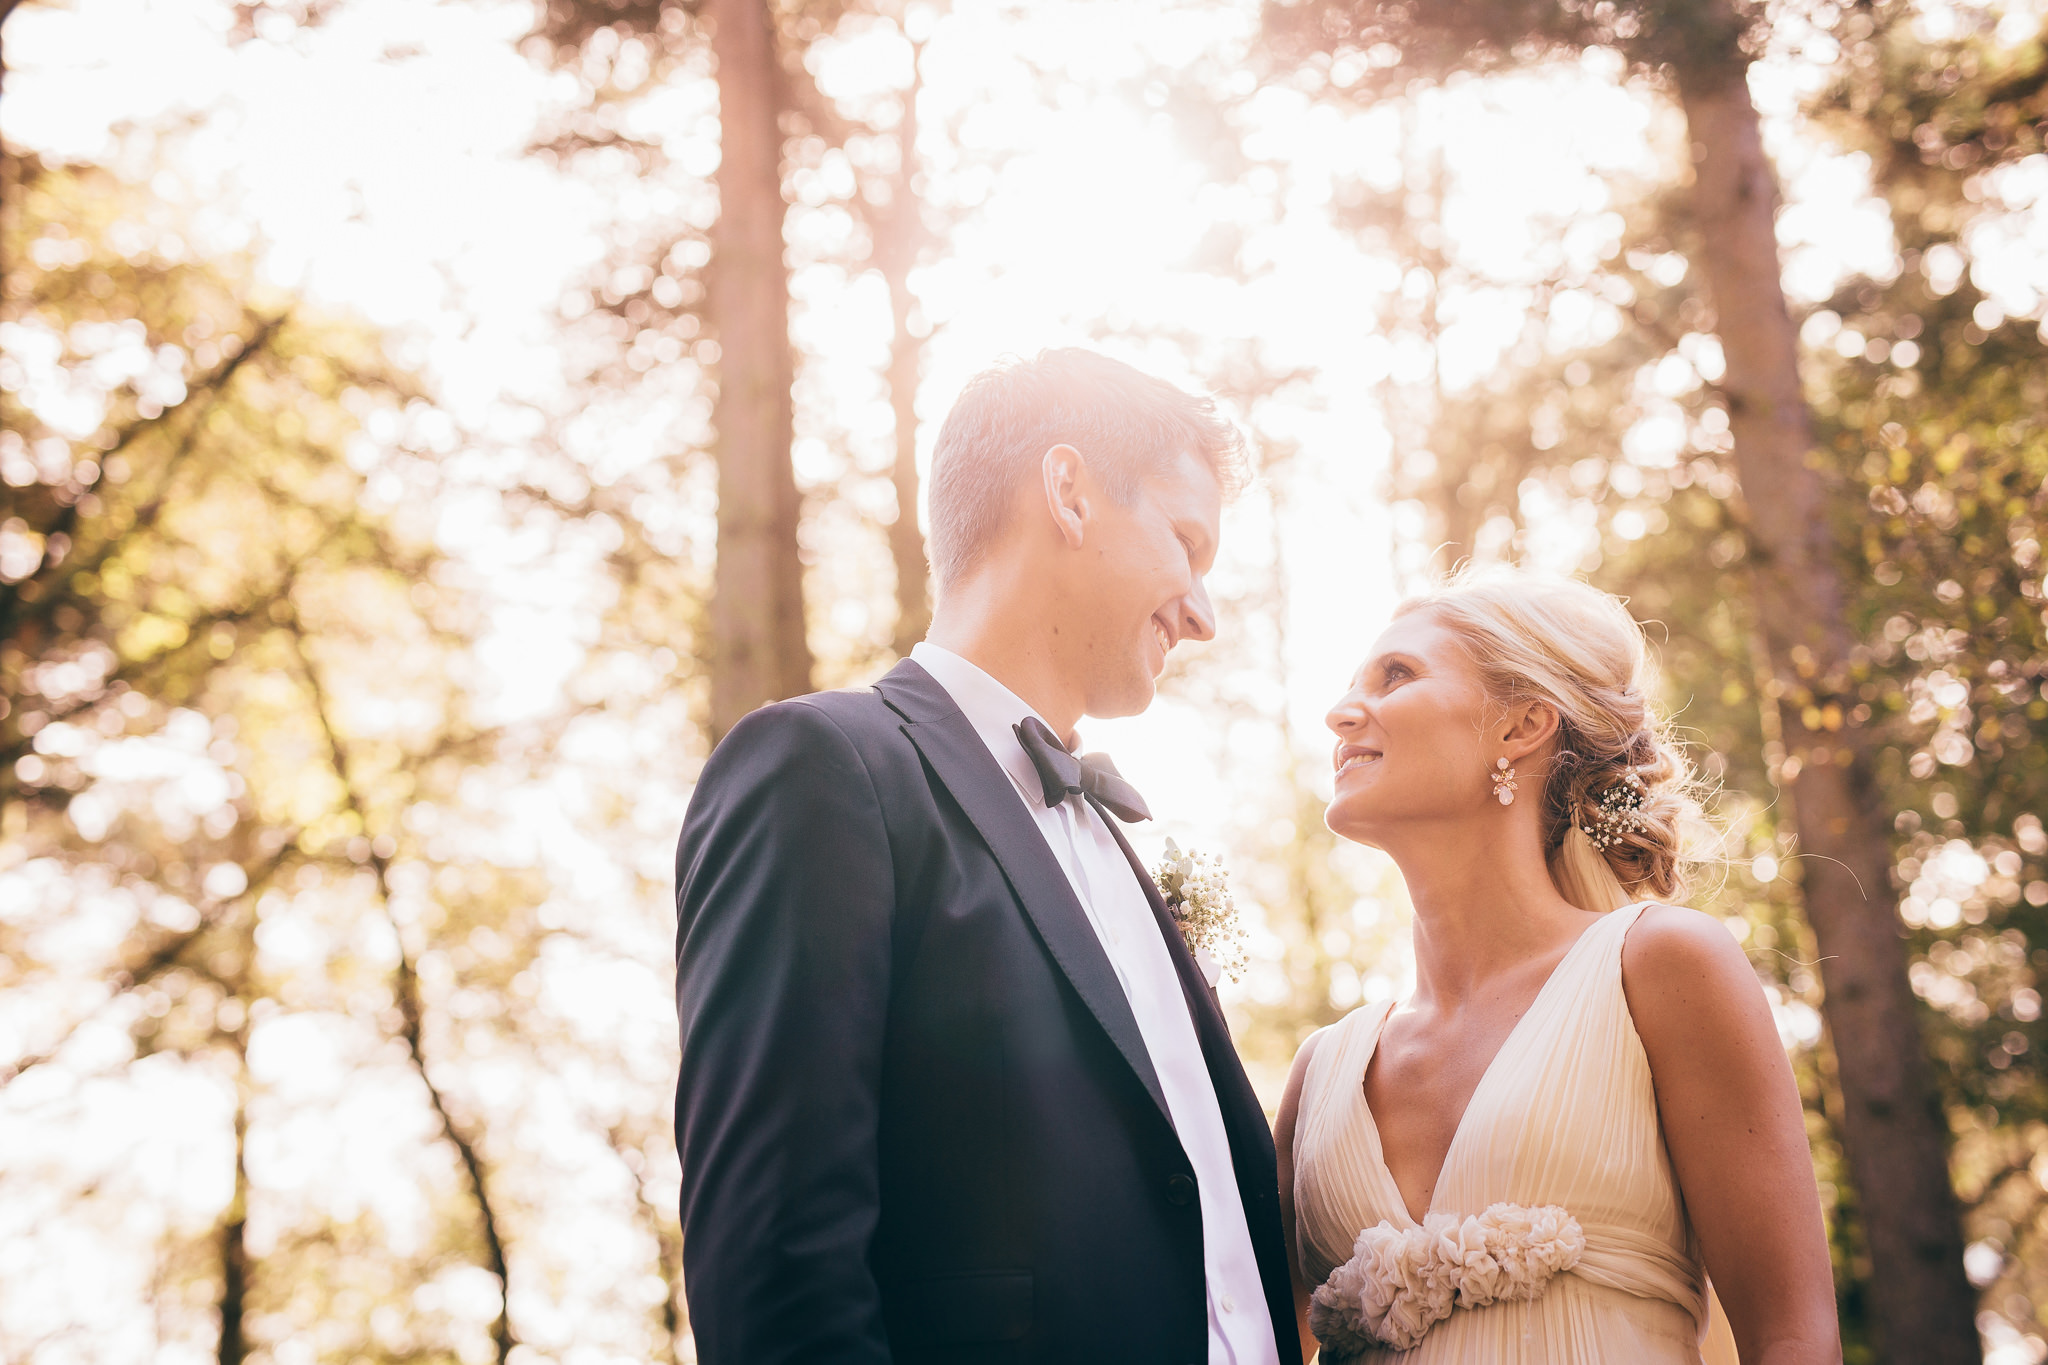 Norway+wedding+photographer+elopement+pre+wedding+Rogaland+bryllupsfotograf+Casey+Arneson-203.jpg